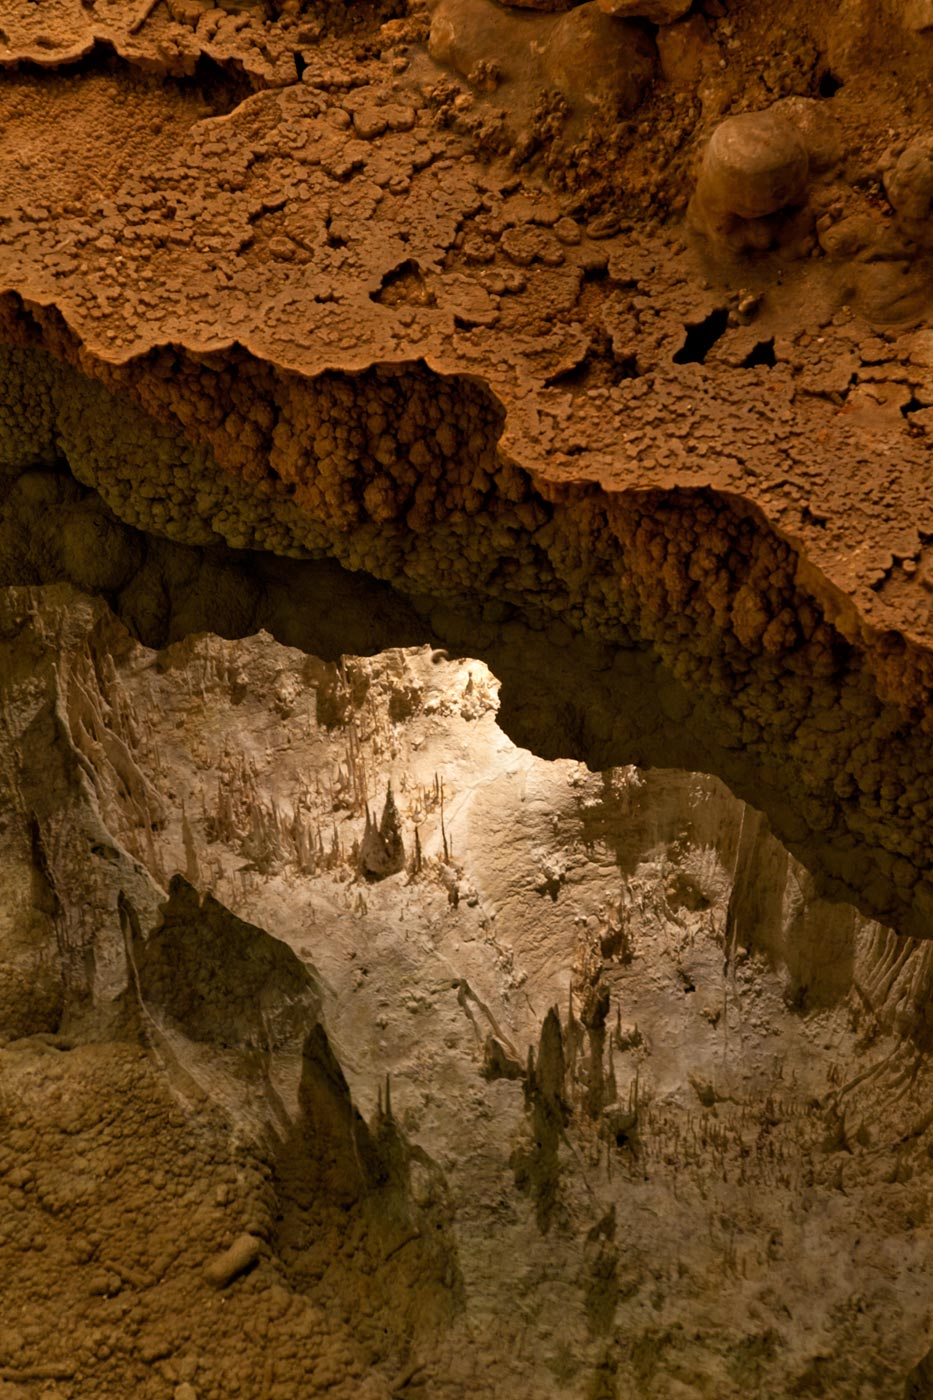 Carlsbad-Caverns-National-Park-ABP-Longfellows-Bathtub.jpg